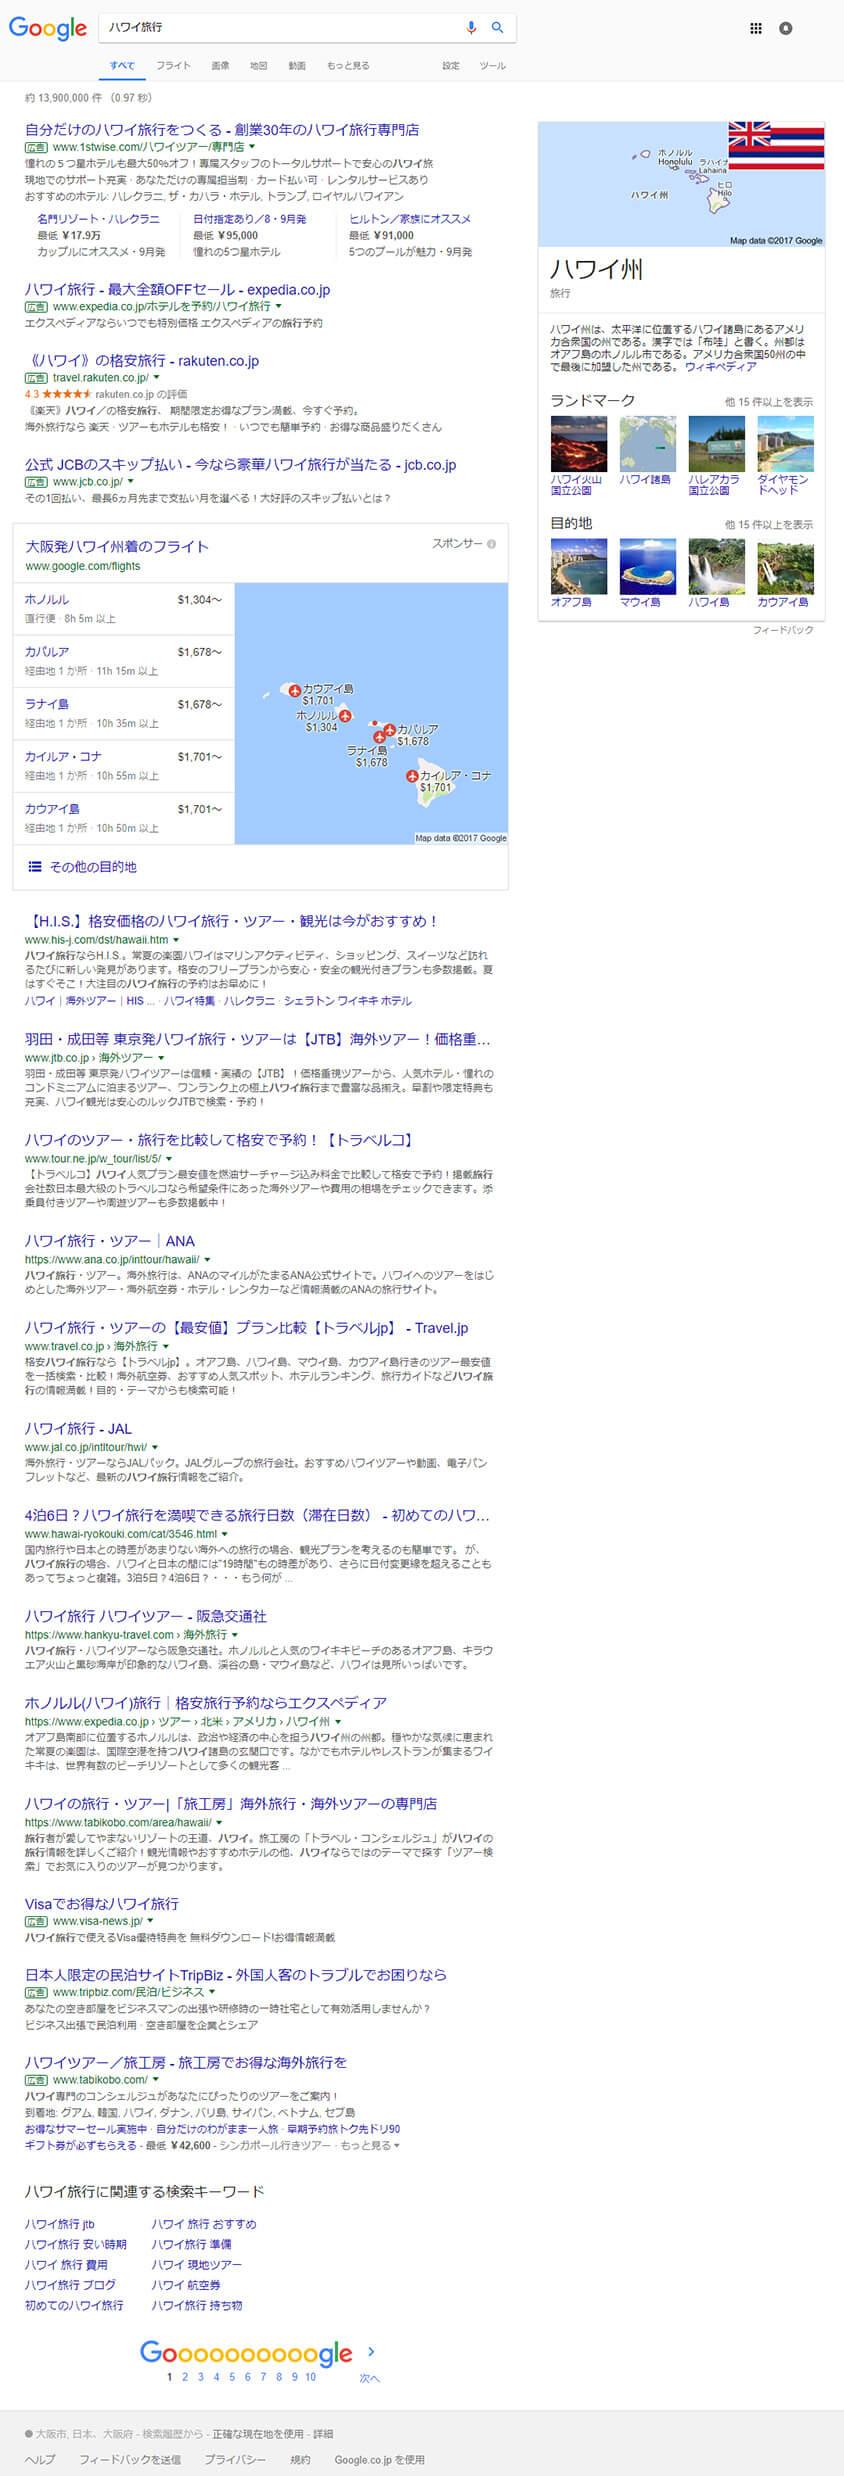 PC広告イメージ